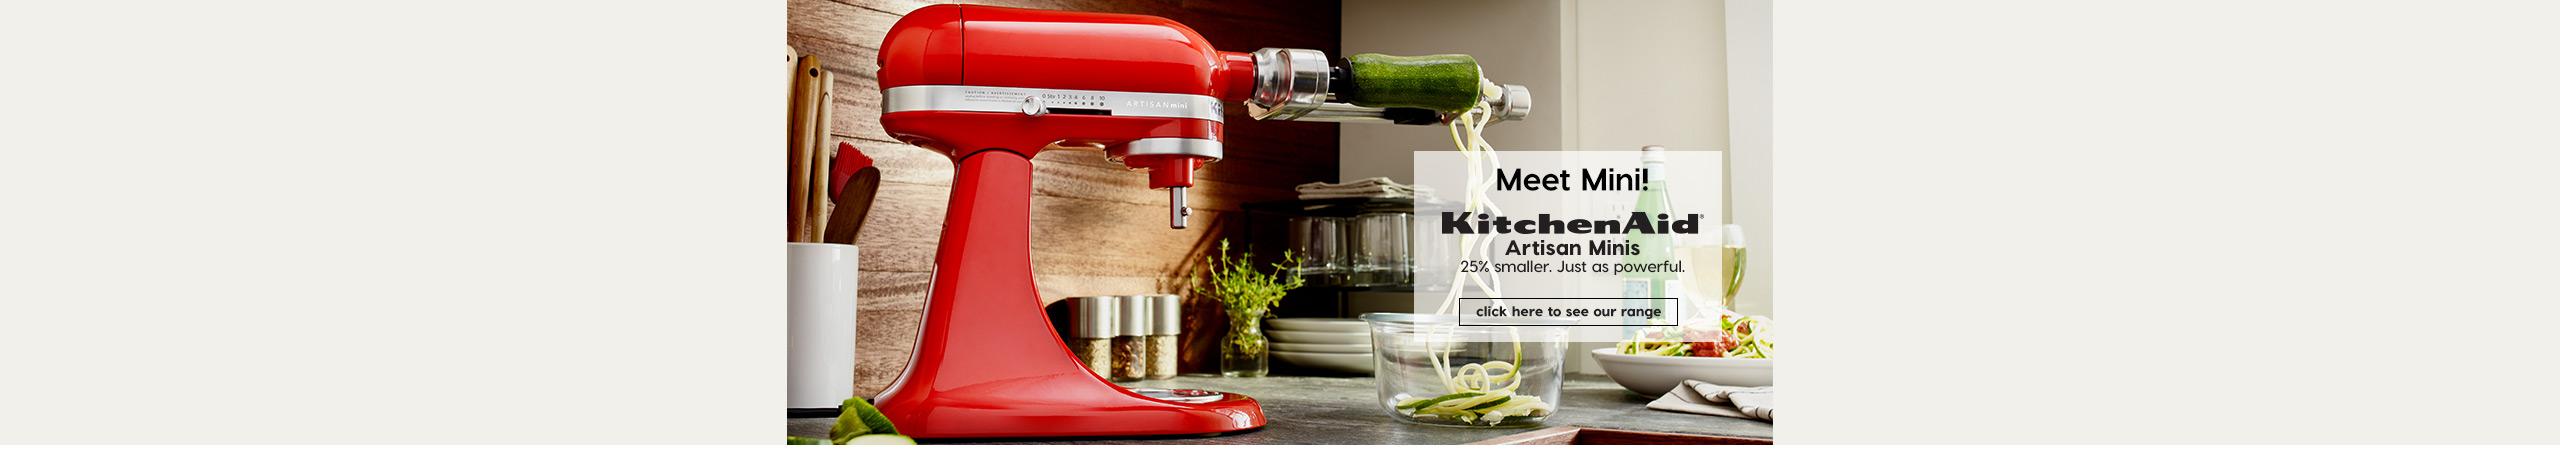 KitchenAid Mini